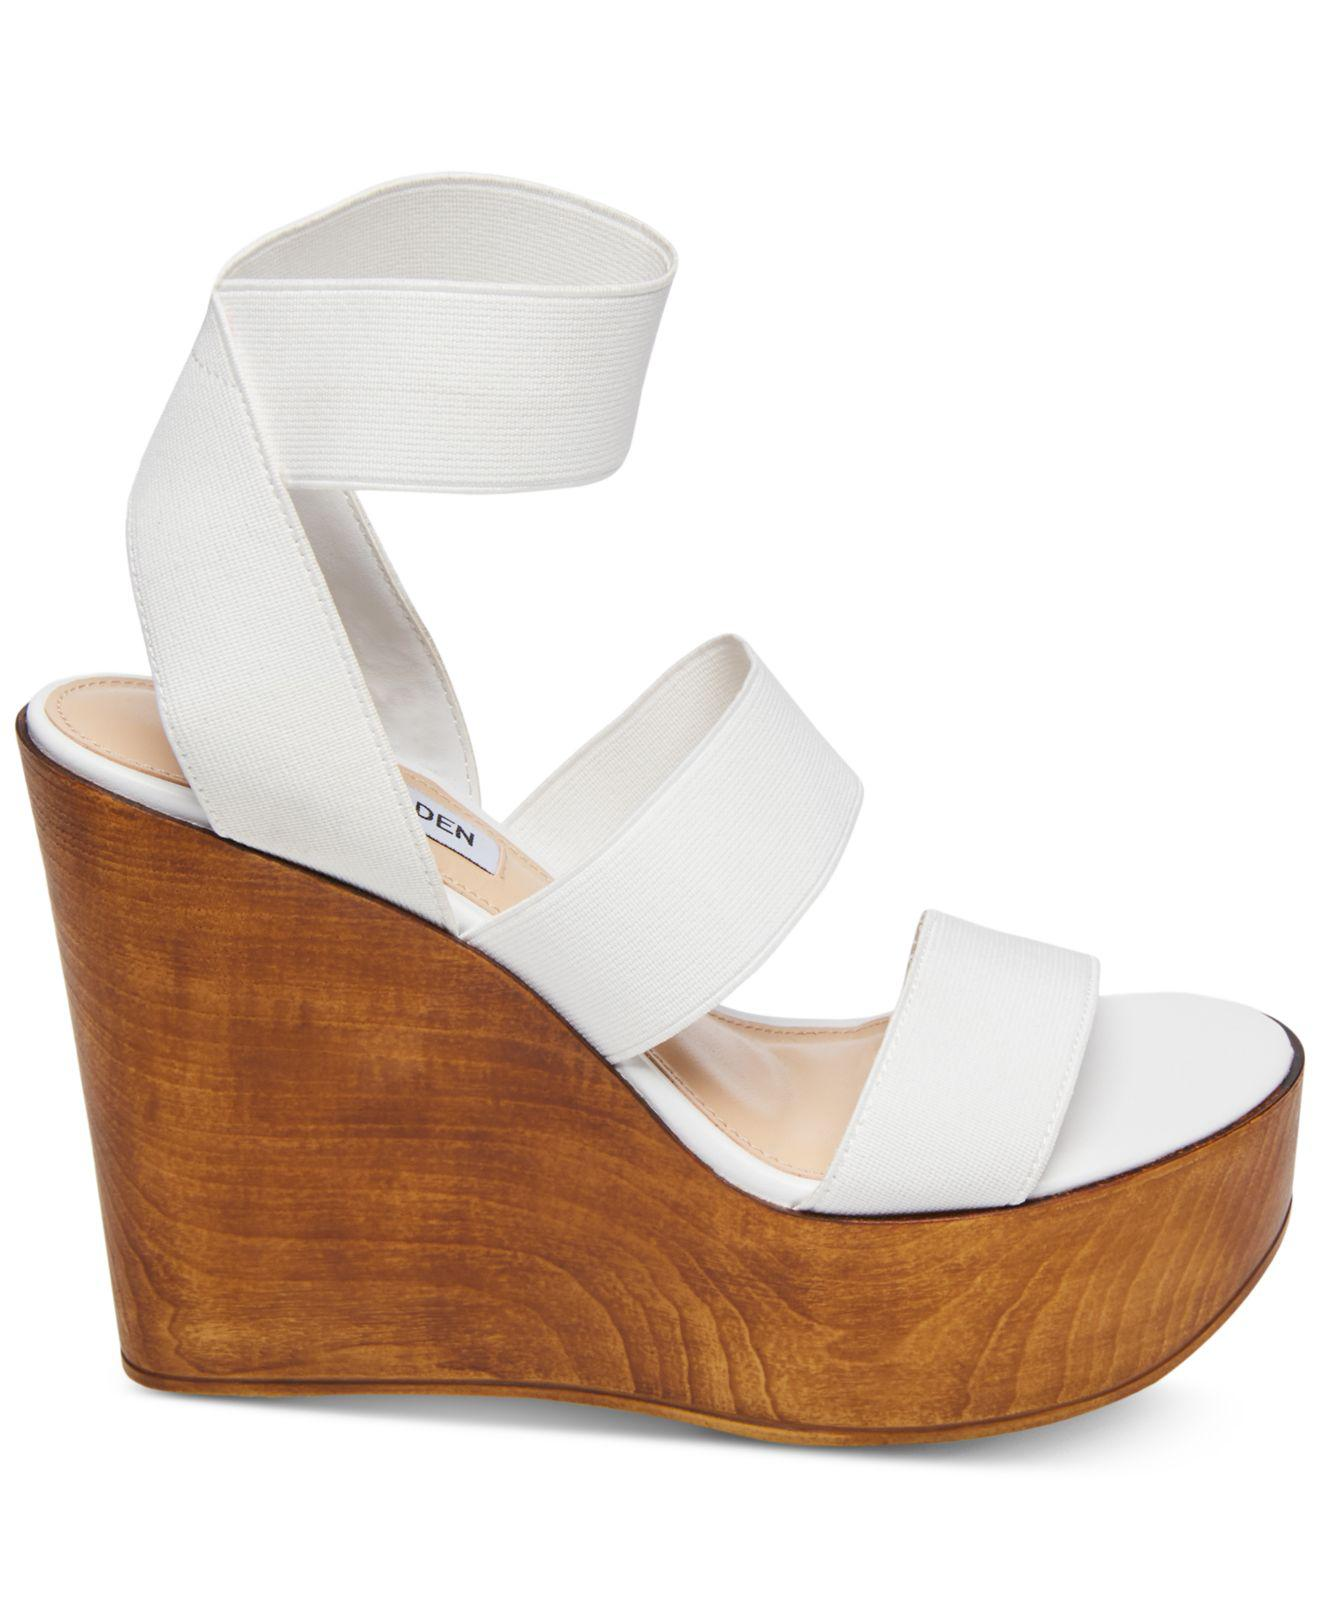 99629a209fde Steve Madden Blondy Wedge Heel Sandals in White - Lyst